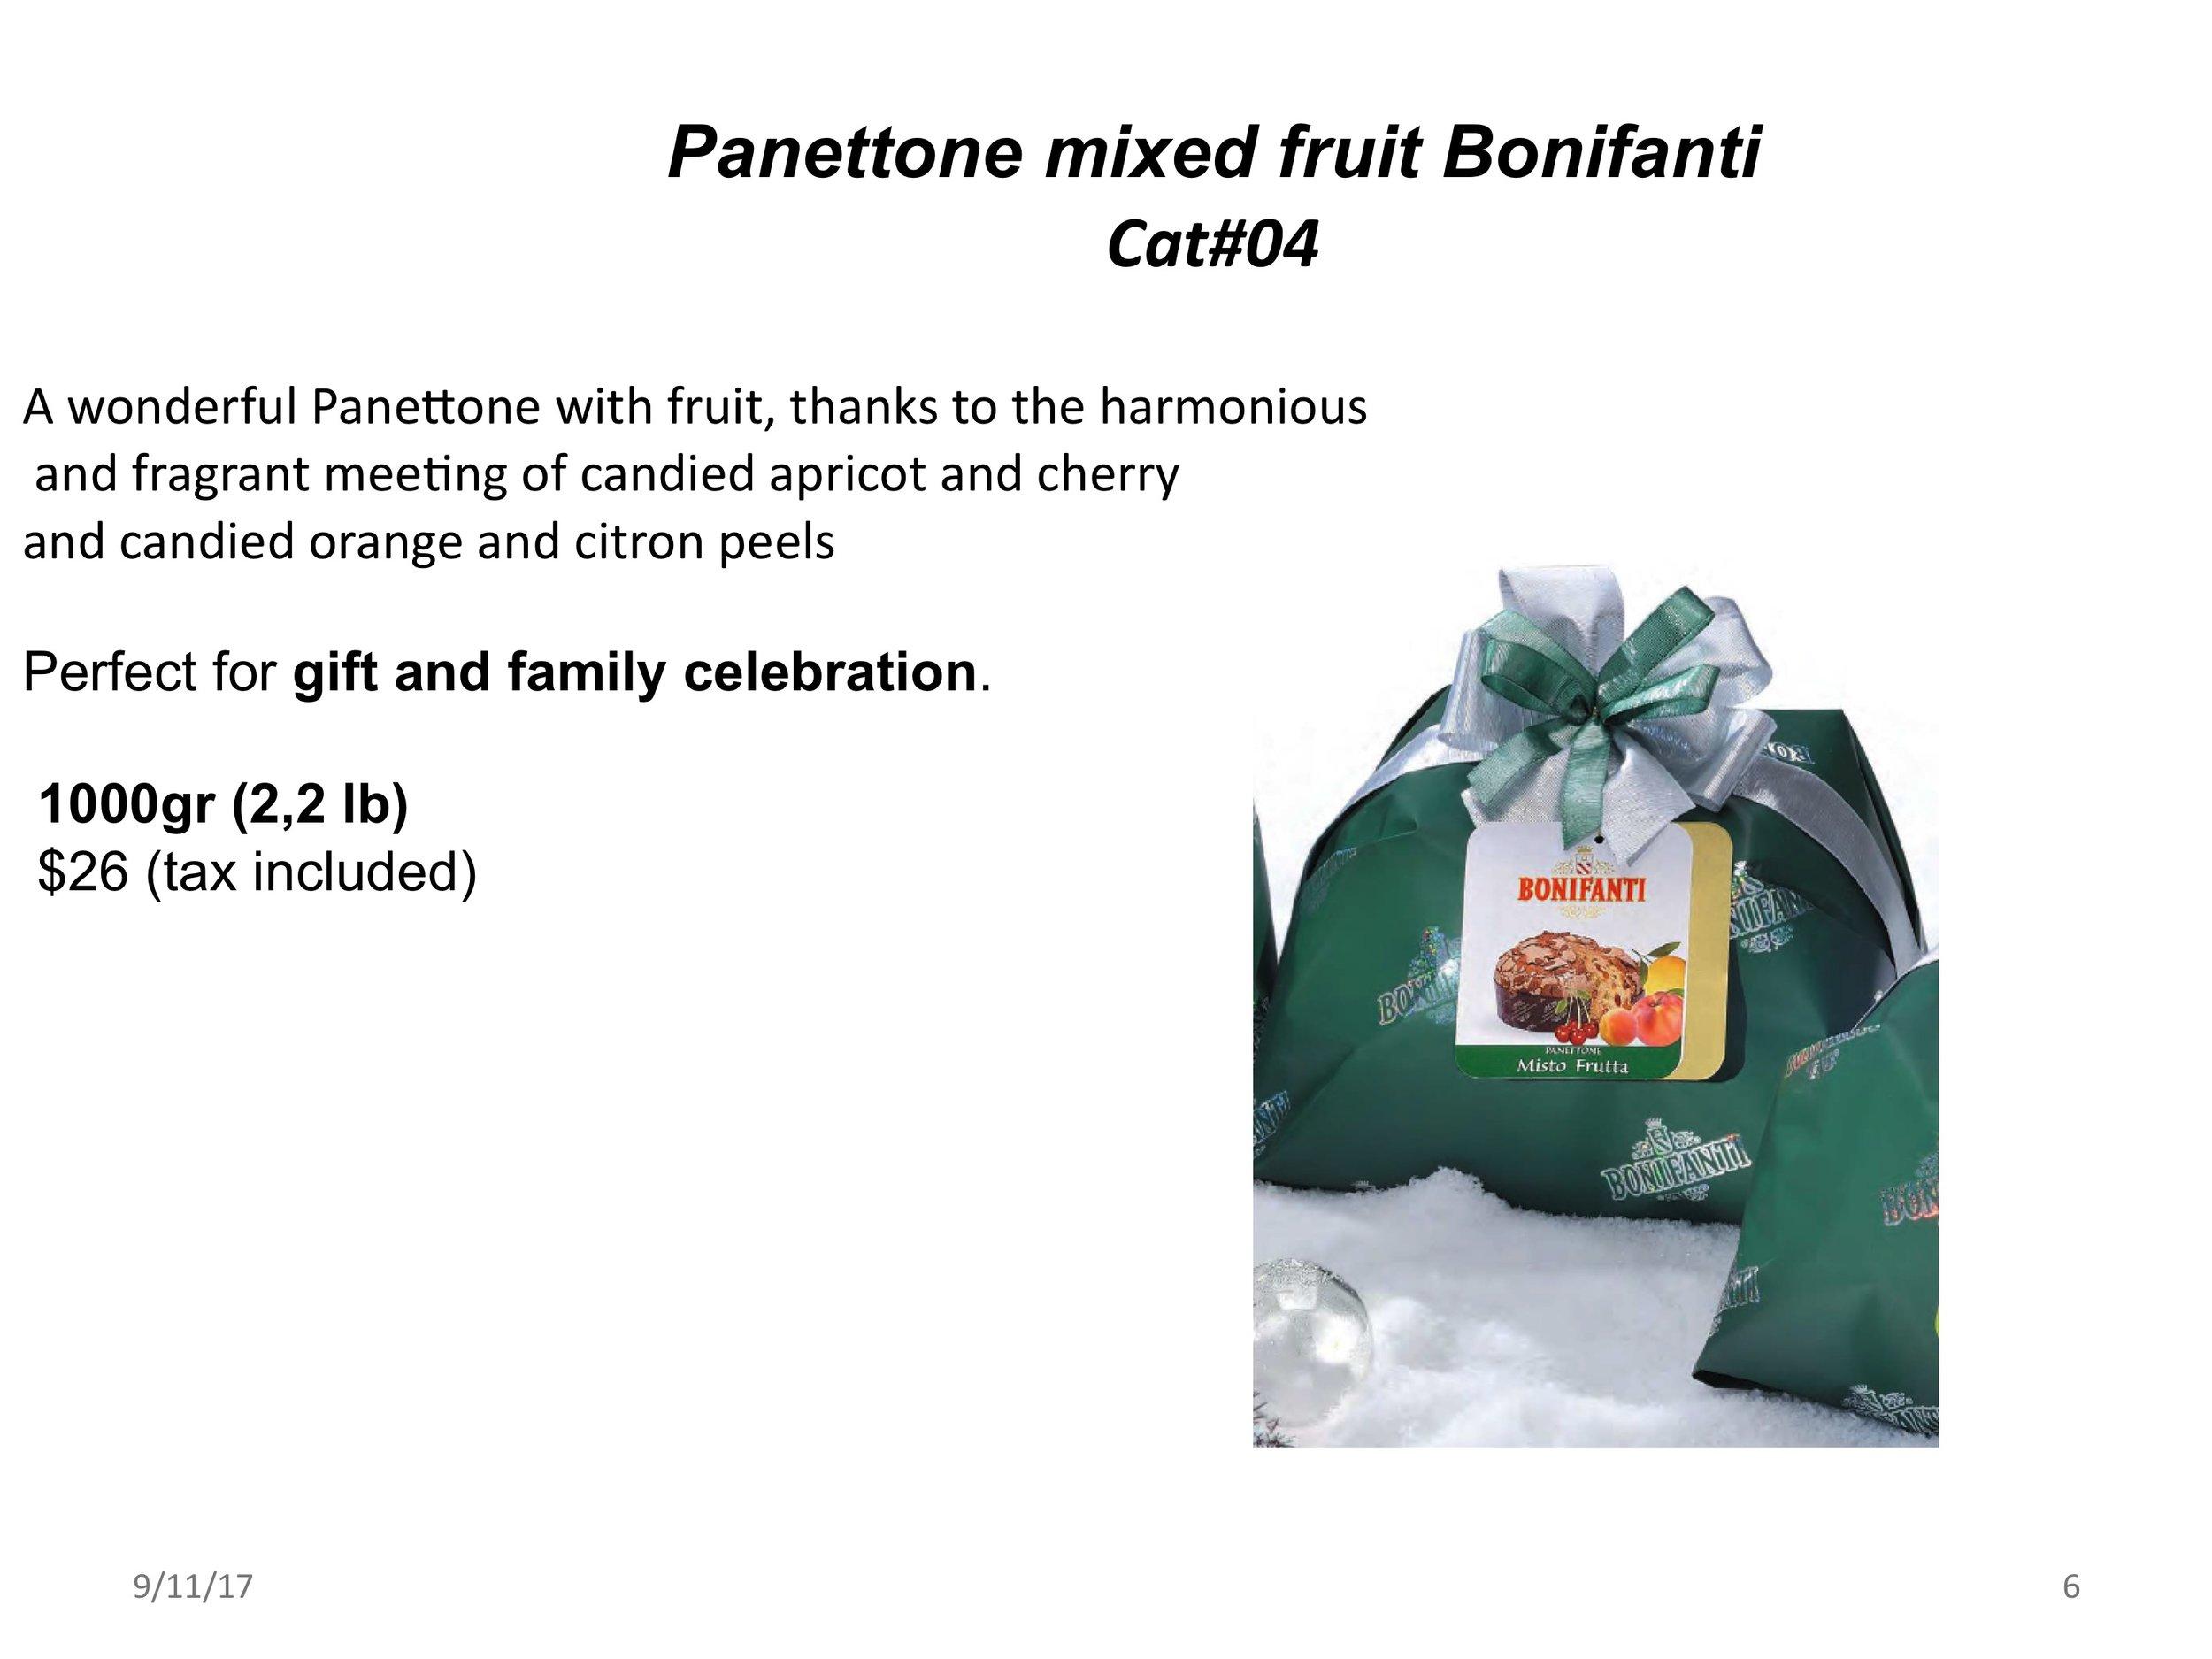 bonifanti_panettone_pg6.jpg